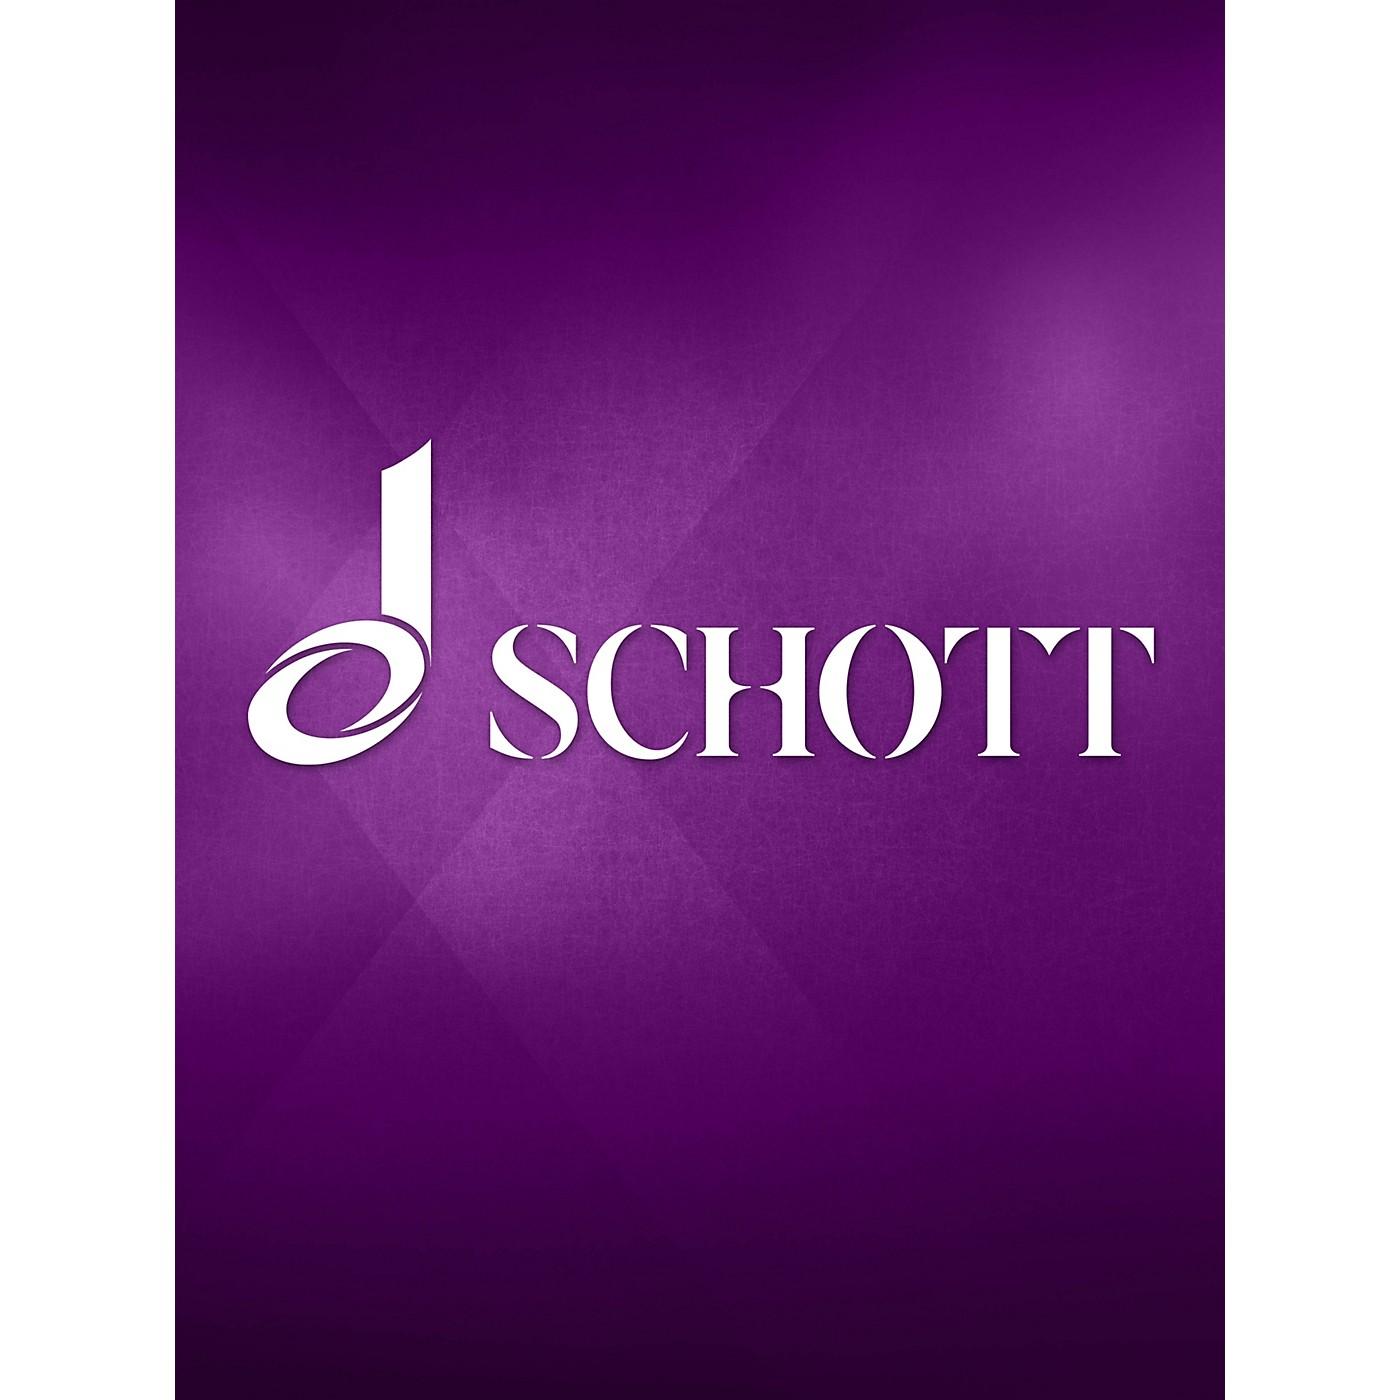 Schott Neue Musik 1999 (Bilanz und Perspektiven (German Text)) Schott Series thumbnail